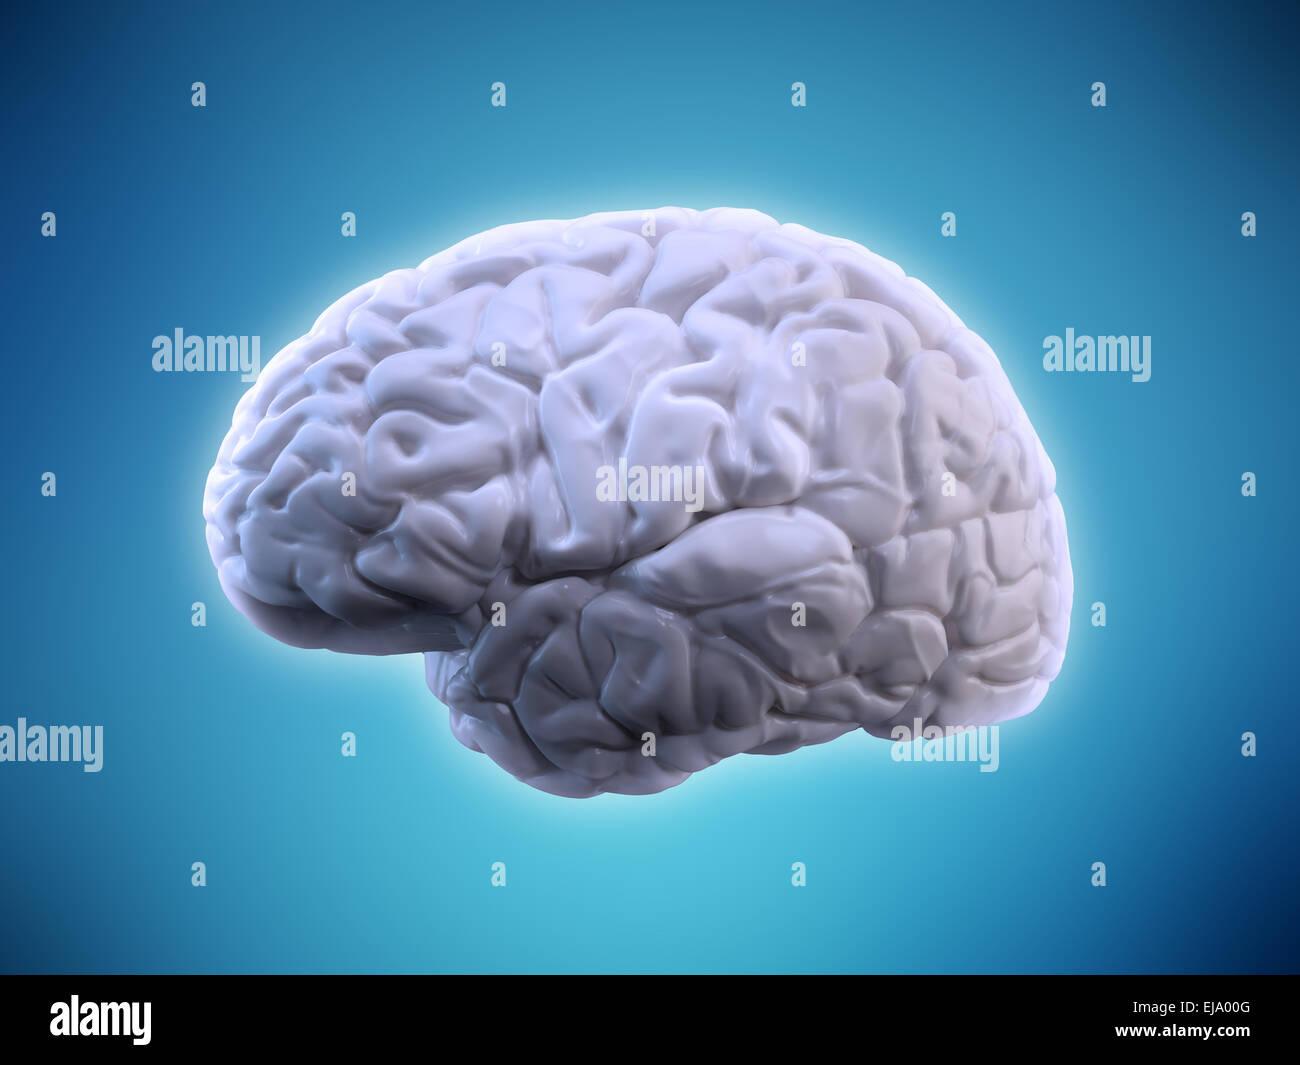 Illustration du cerveau humain - l'anatomie humaine Photo Stock